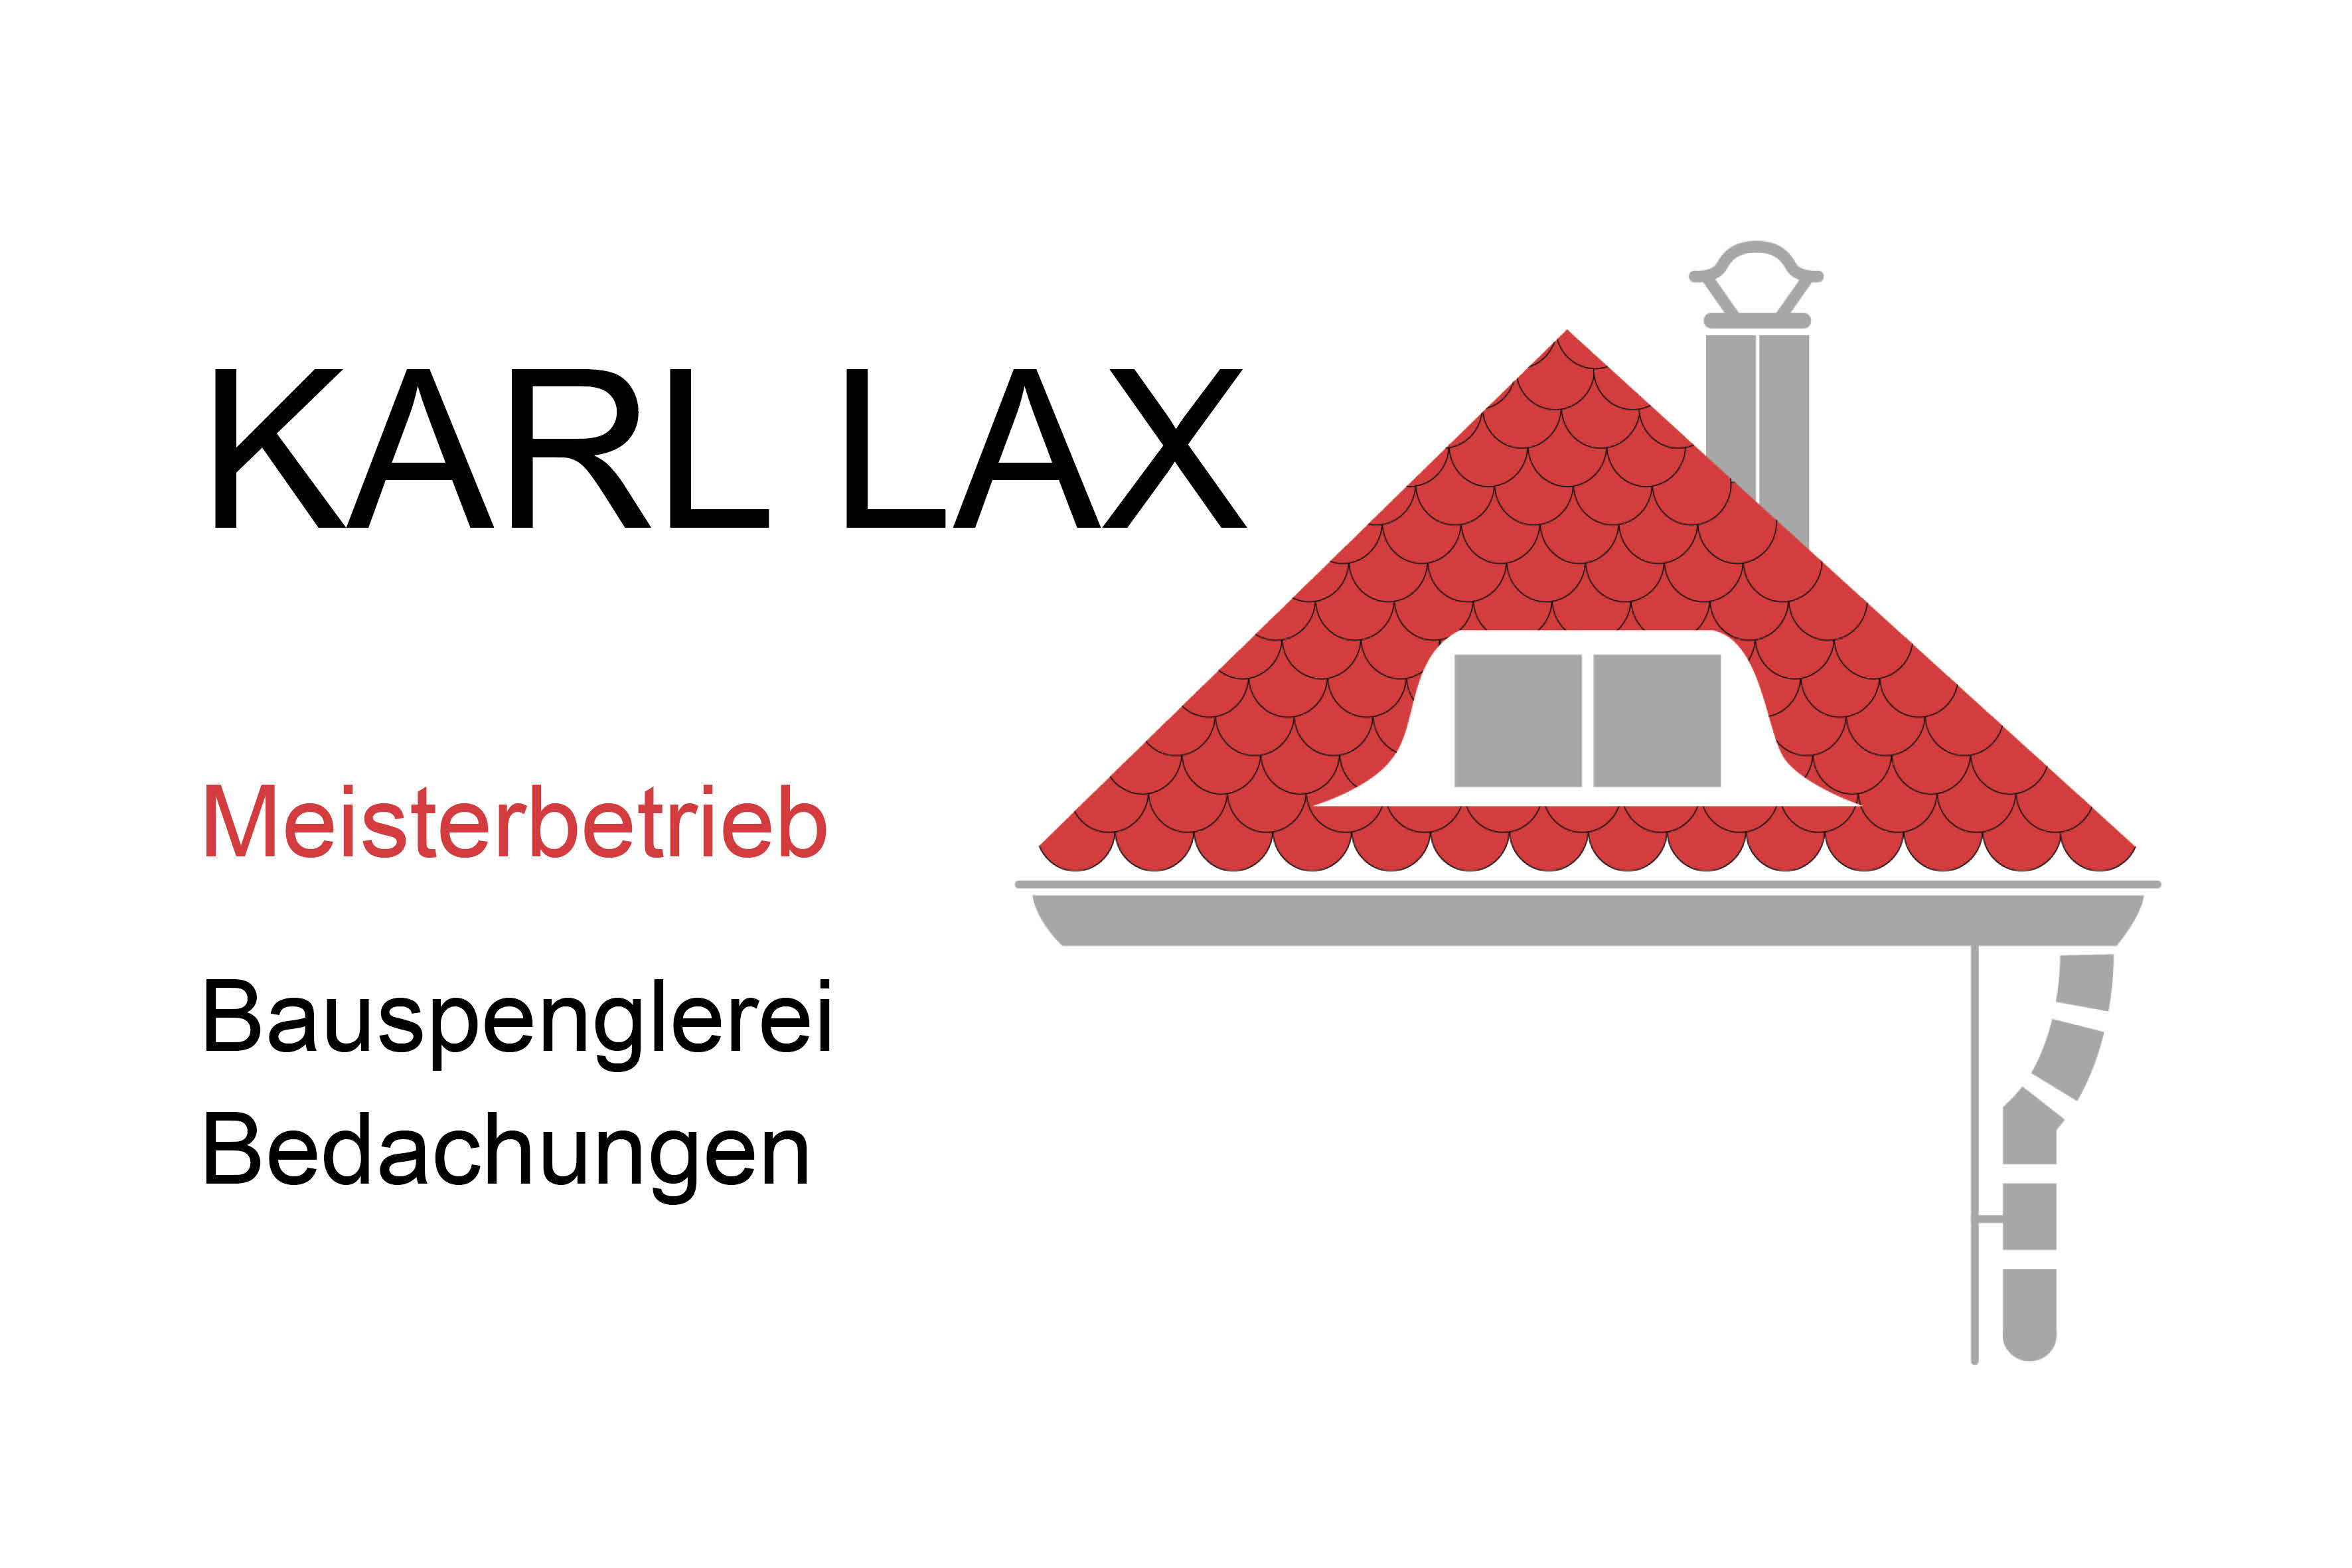 Lax-logo-mit-name-Kleiner